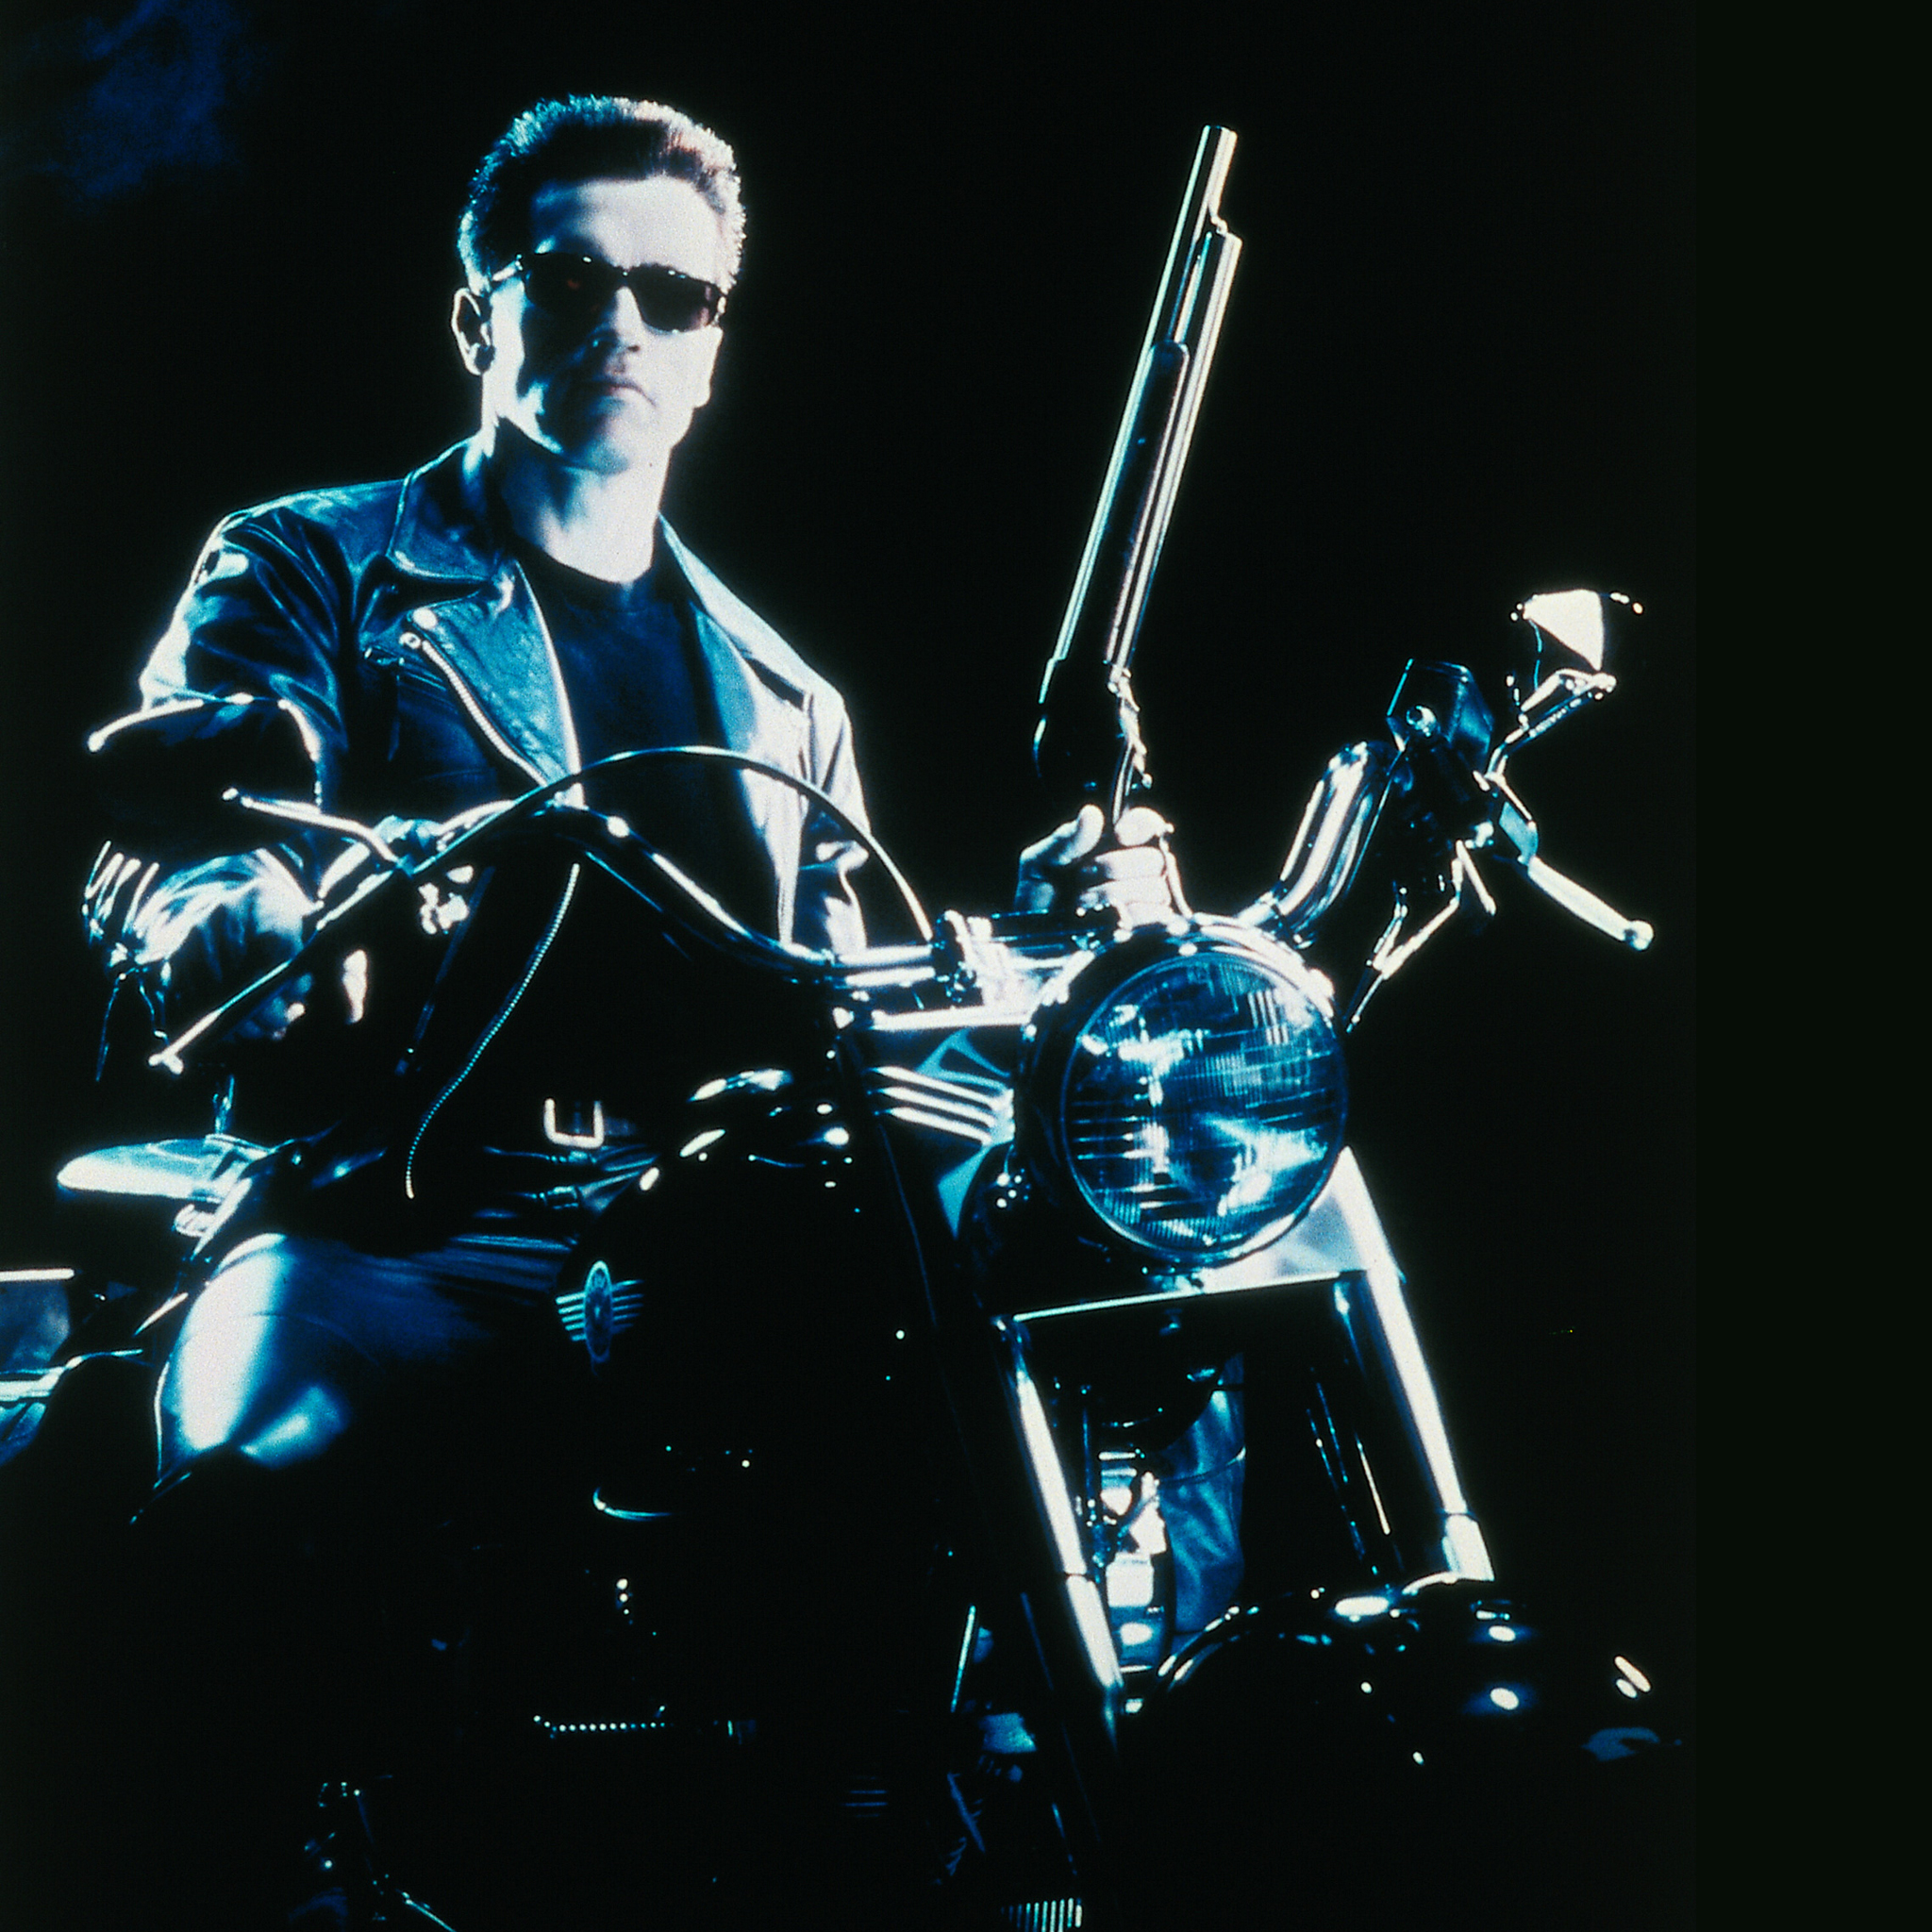 Terminator2 3W iPad Terminator 2   iPad